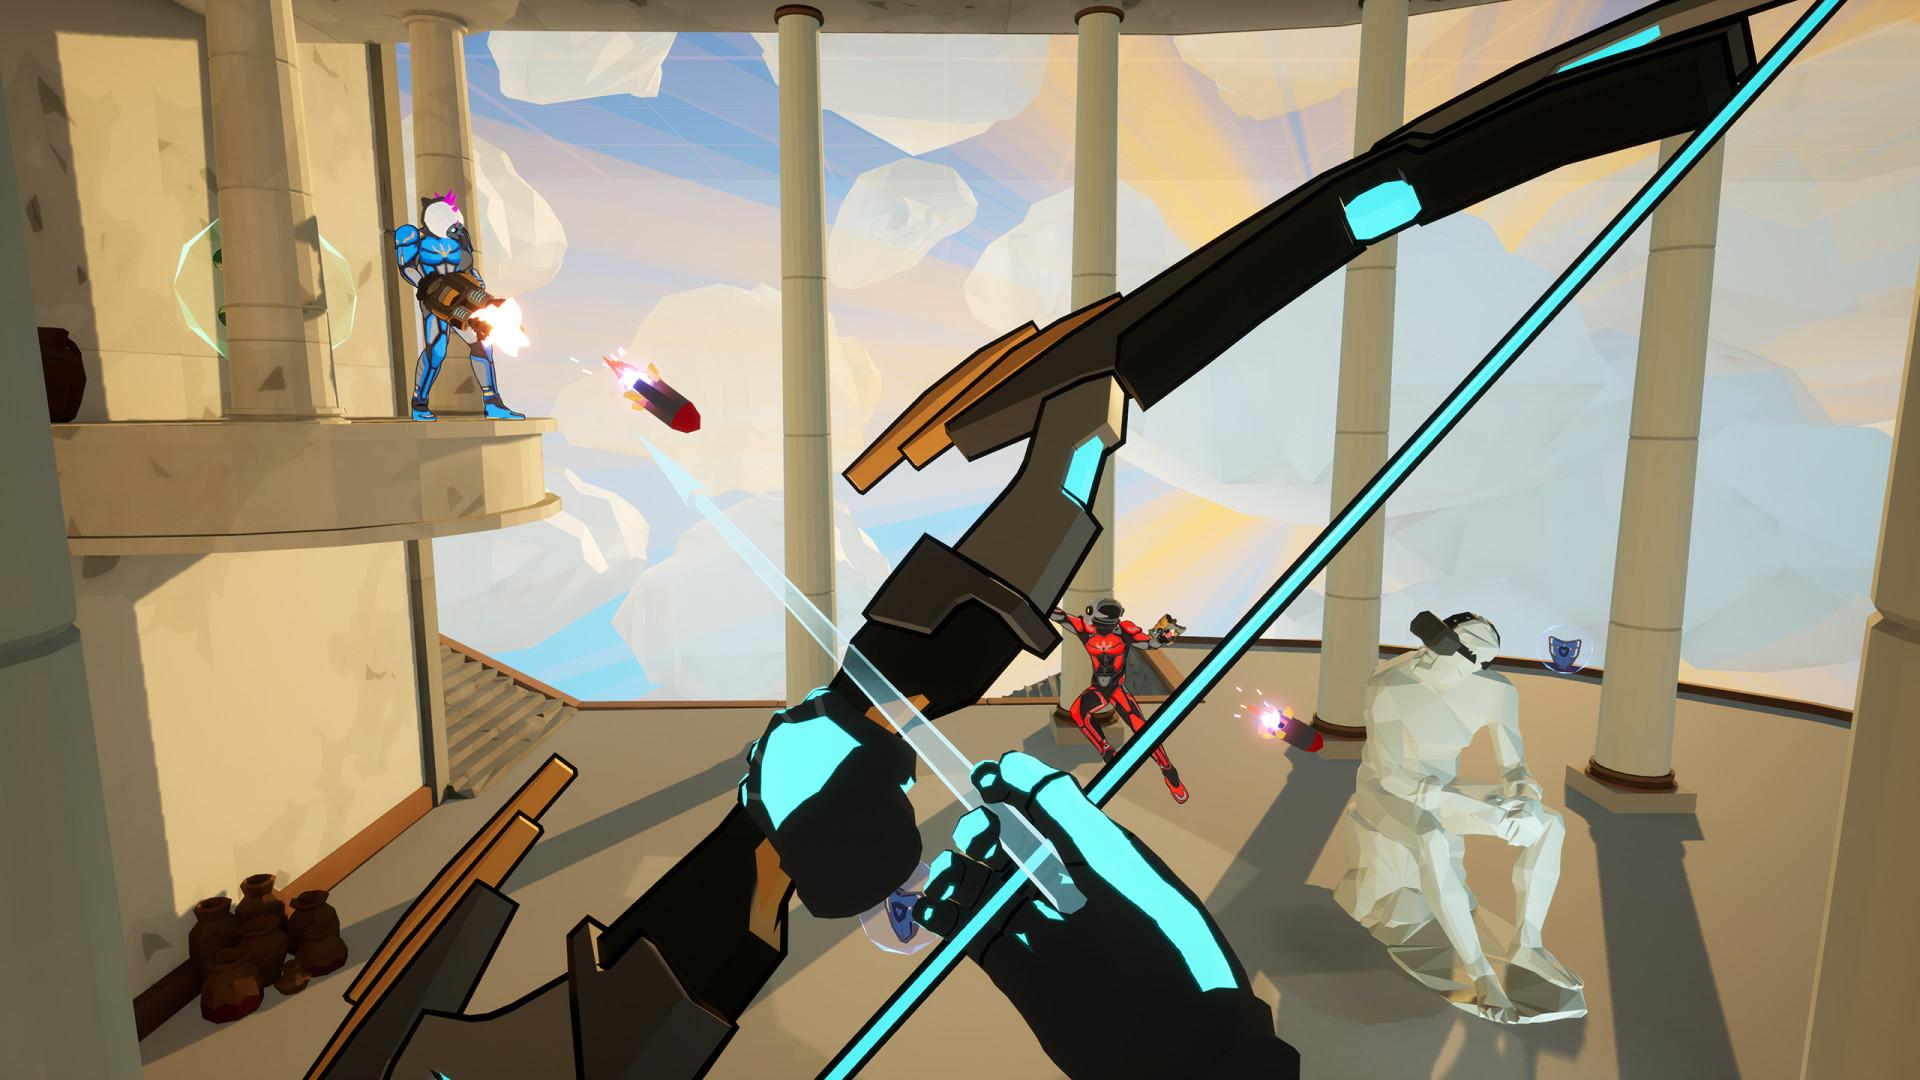 Oculus Quest 游戏《Grapple Tournament》格斗锦标赛VR插图(2)